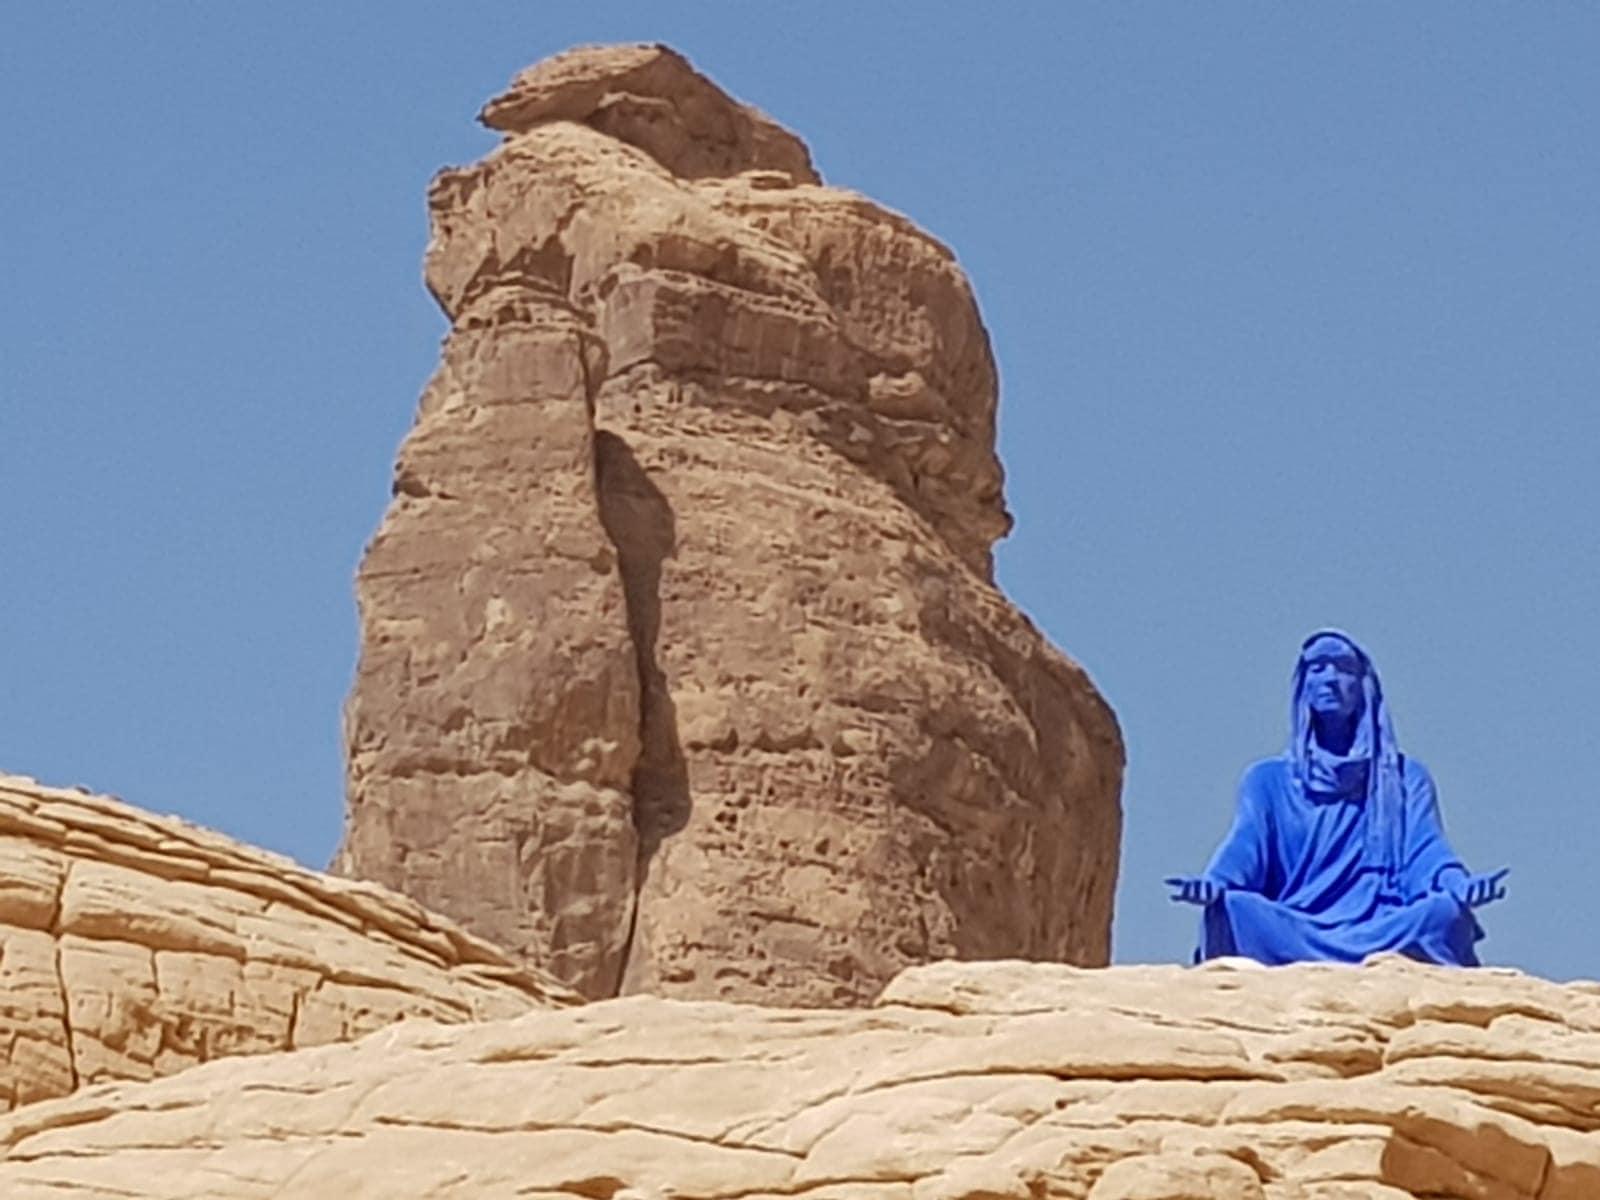 königsblaue Frauenfigur